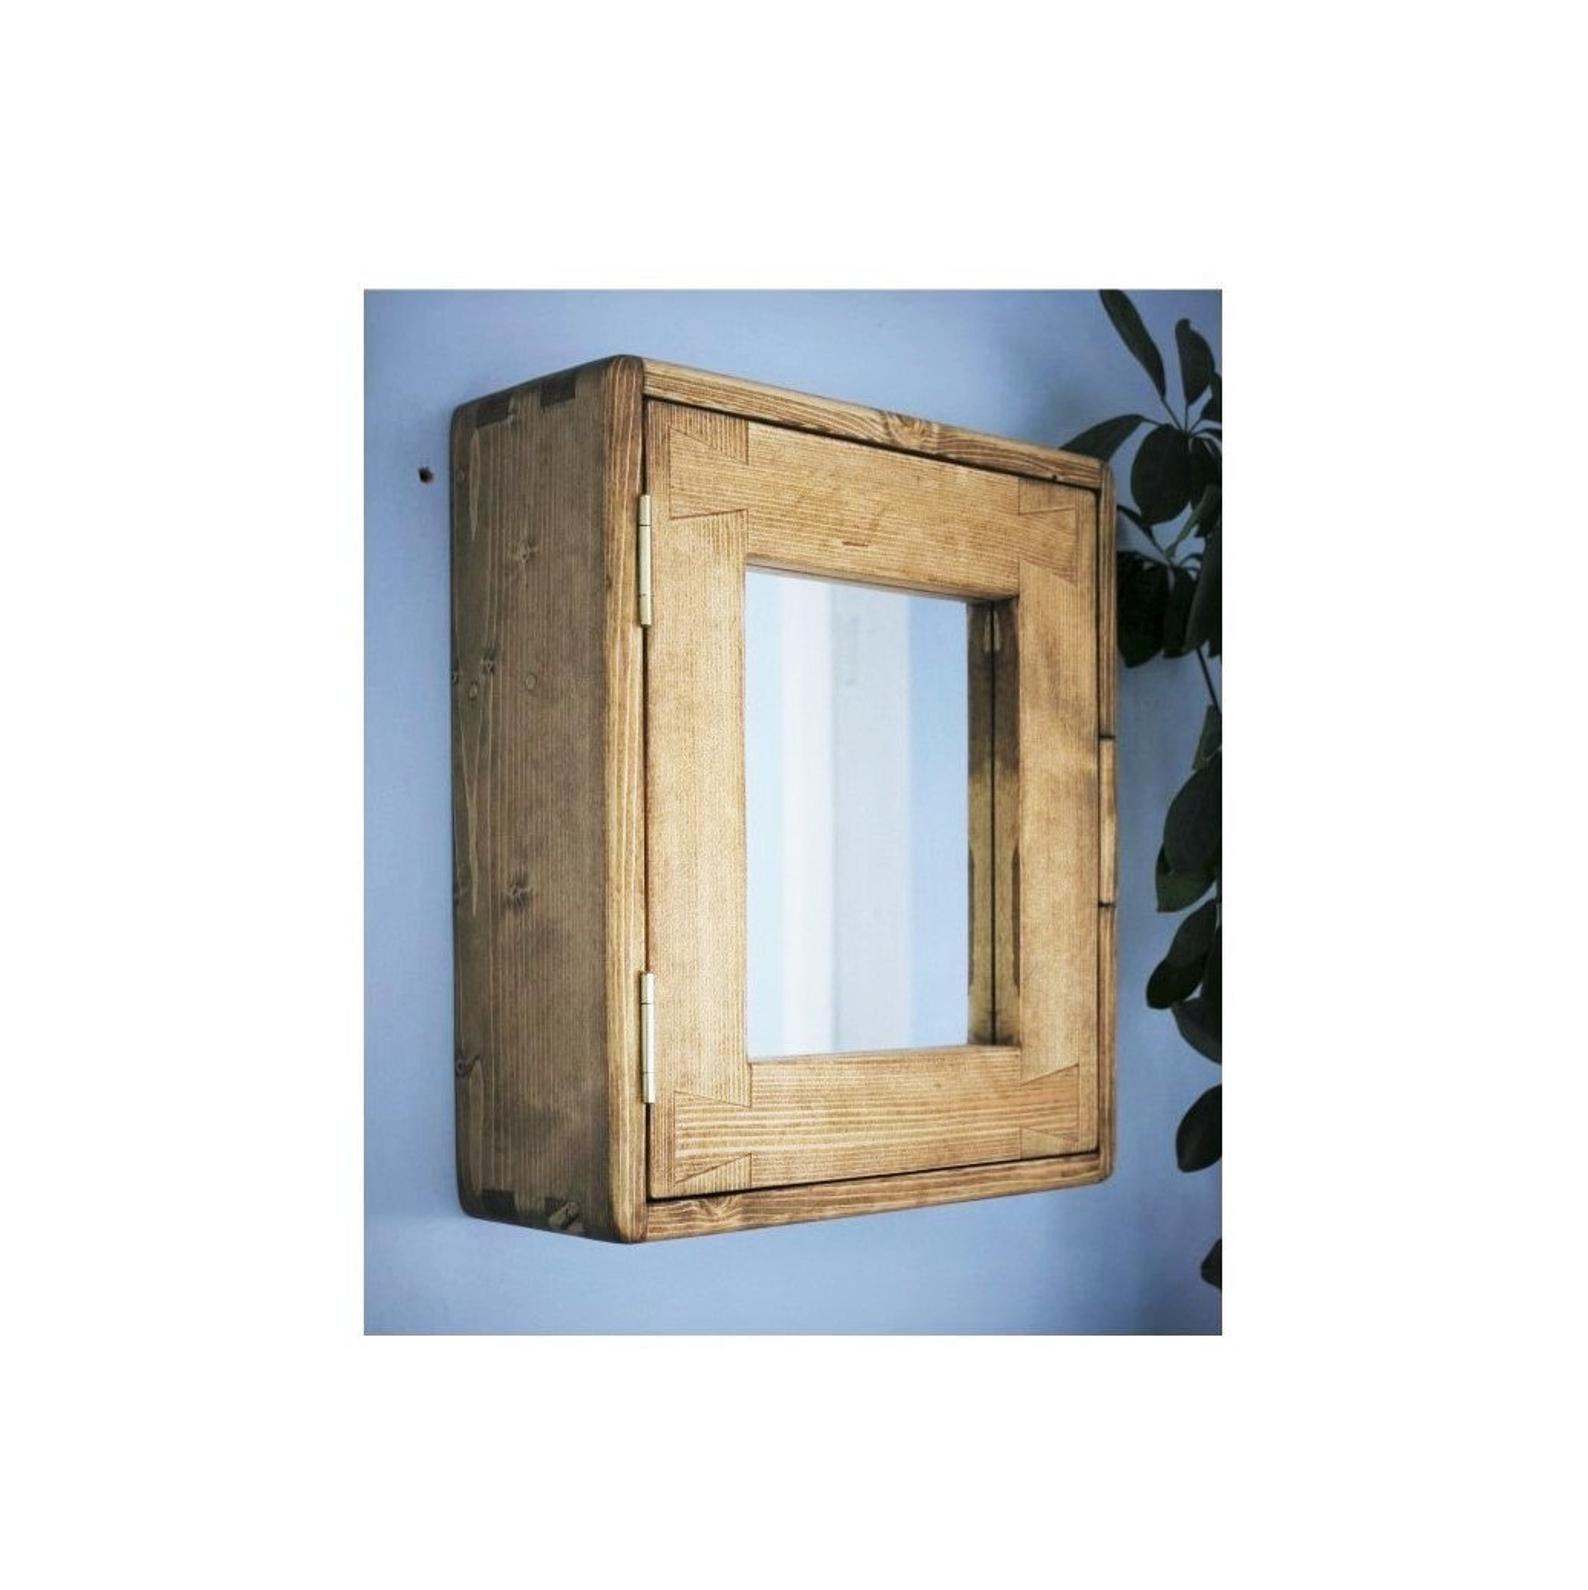 Bathroom Wall Cabinet Natural Eco Solid Wood Small Mirror Door 43 5 H X 38 5 W Cm 2 Shelves Modern Rustic Custom Handmade Somerset Rustic Wooden Furniture Bathroom Wall Cabinets Small Mirrors